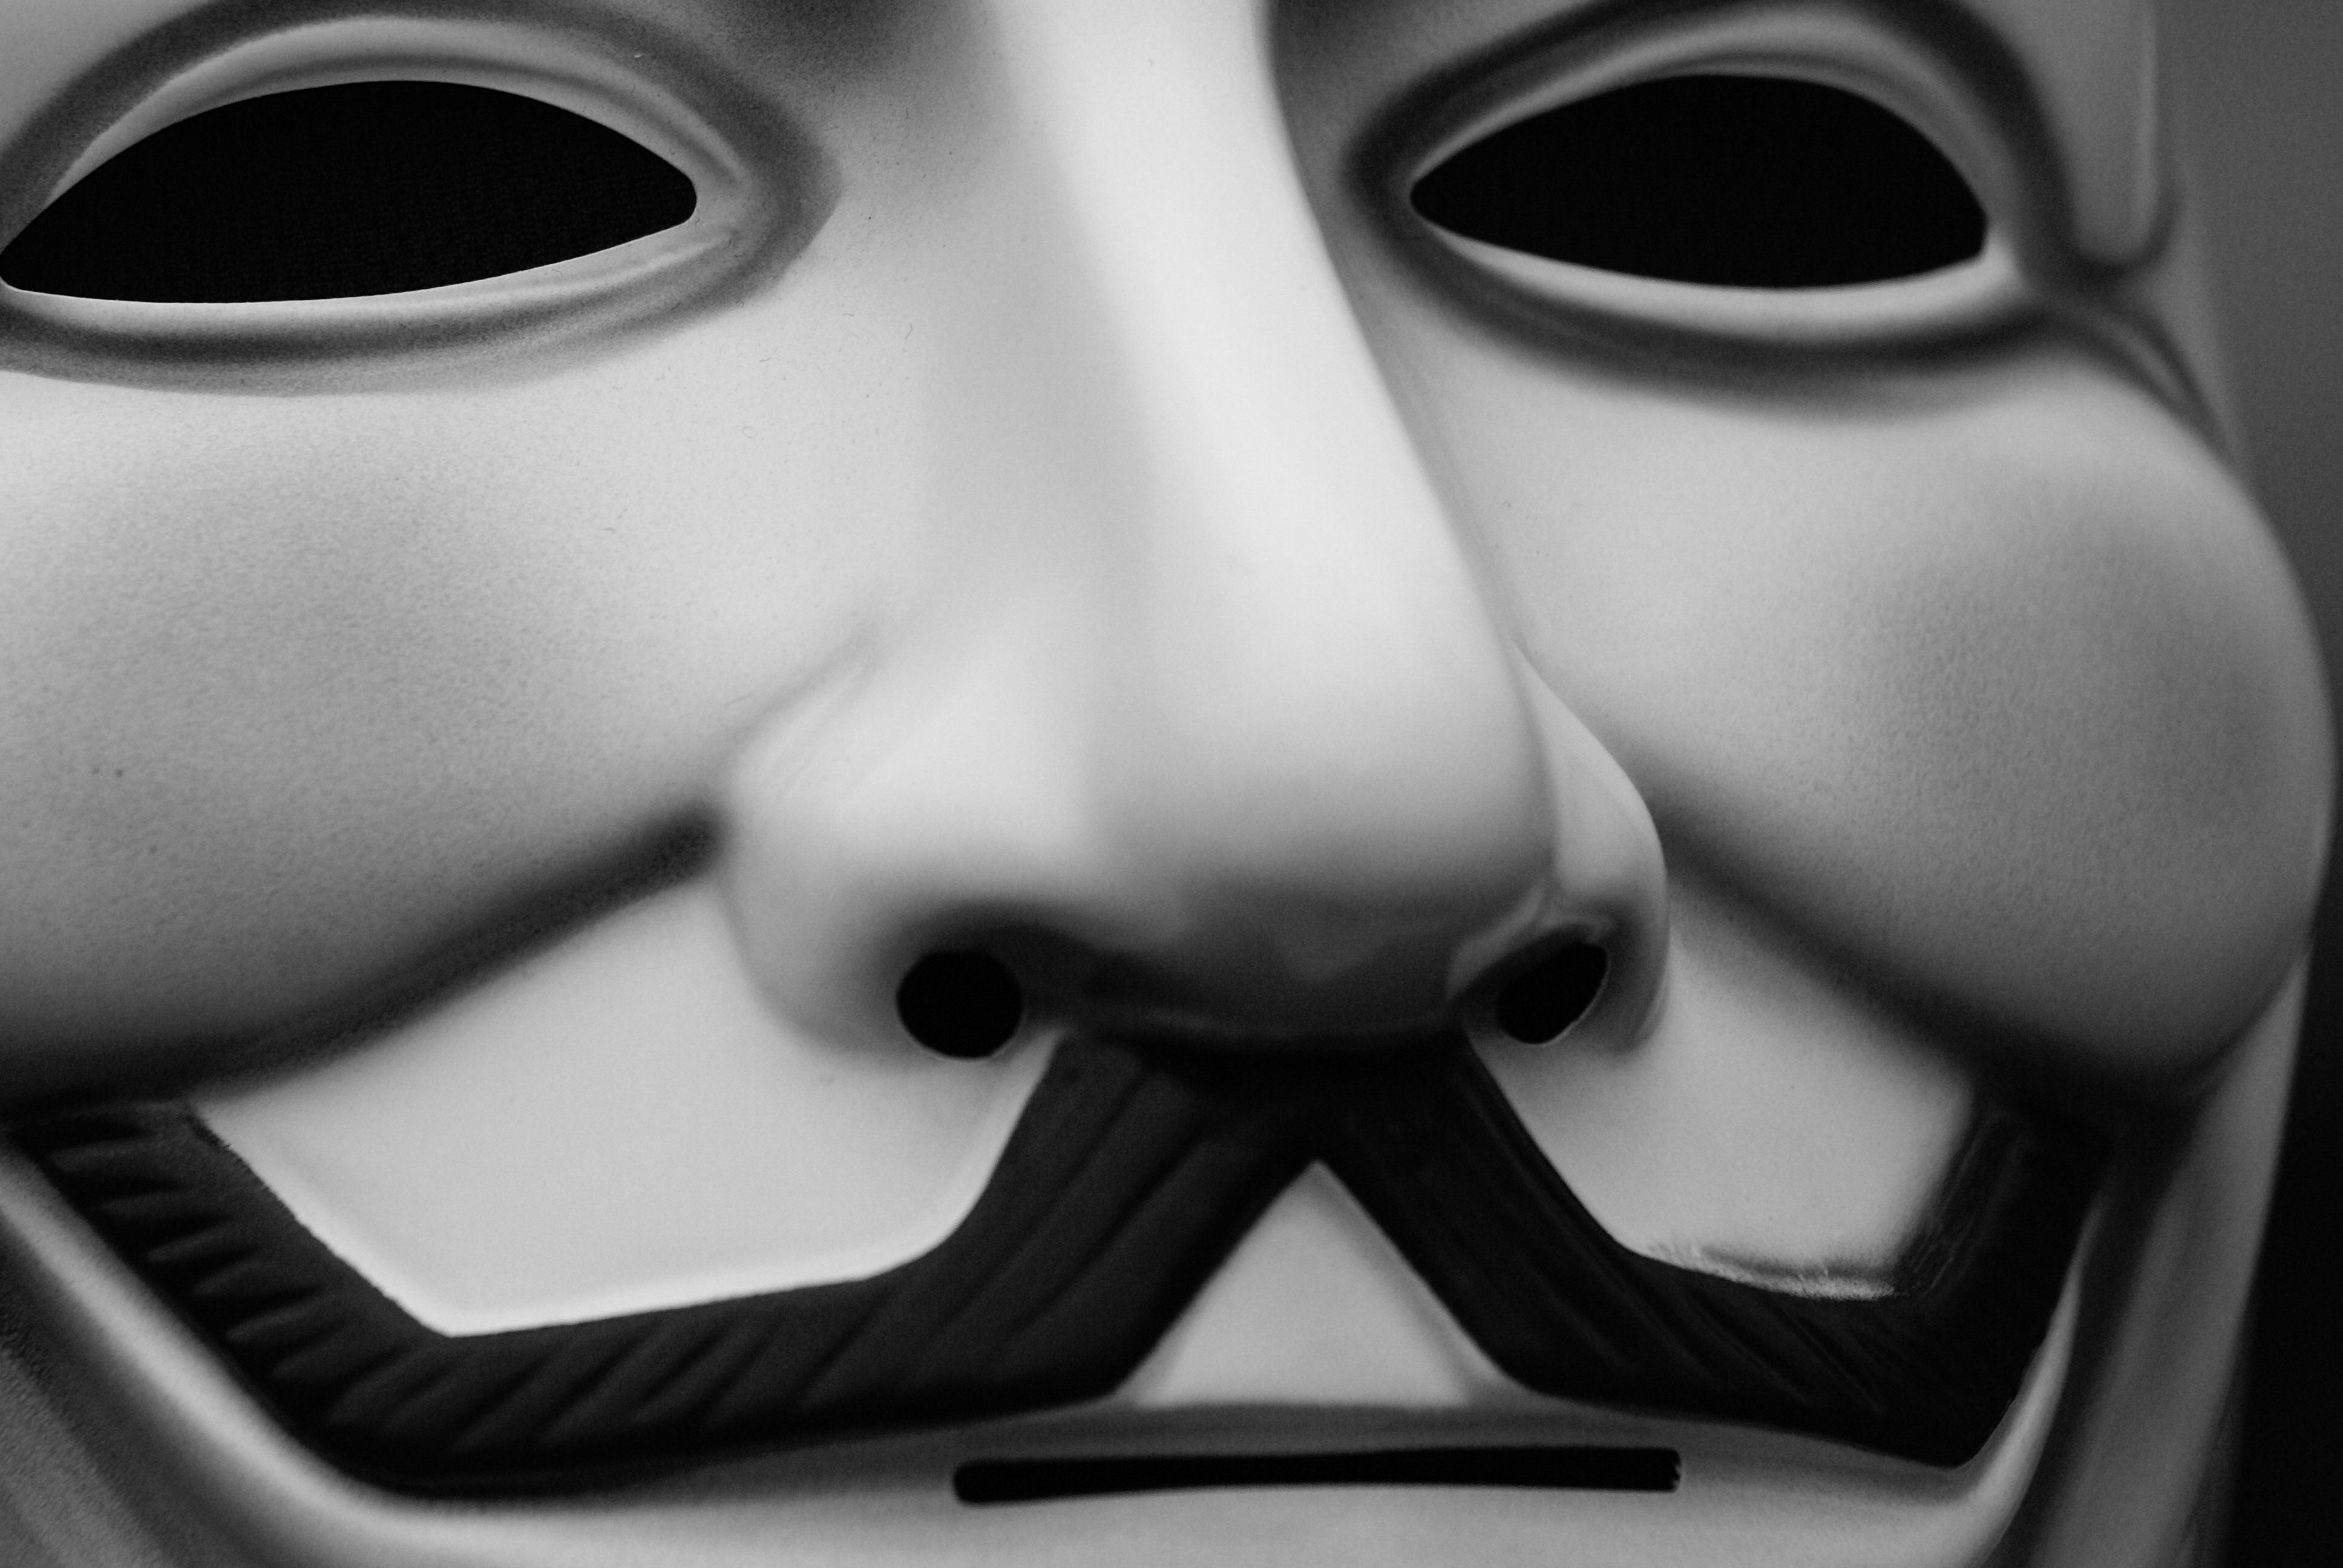 masks_guy_fawkes_for_vendetta_desktop_3872x2592_hd-wallpaper-656454